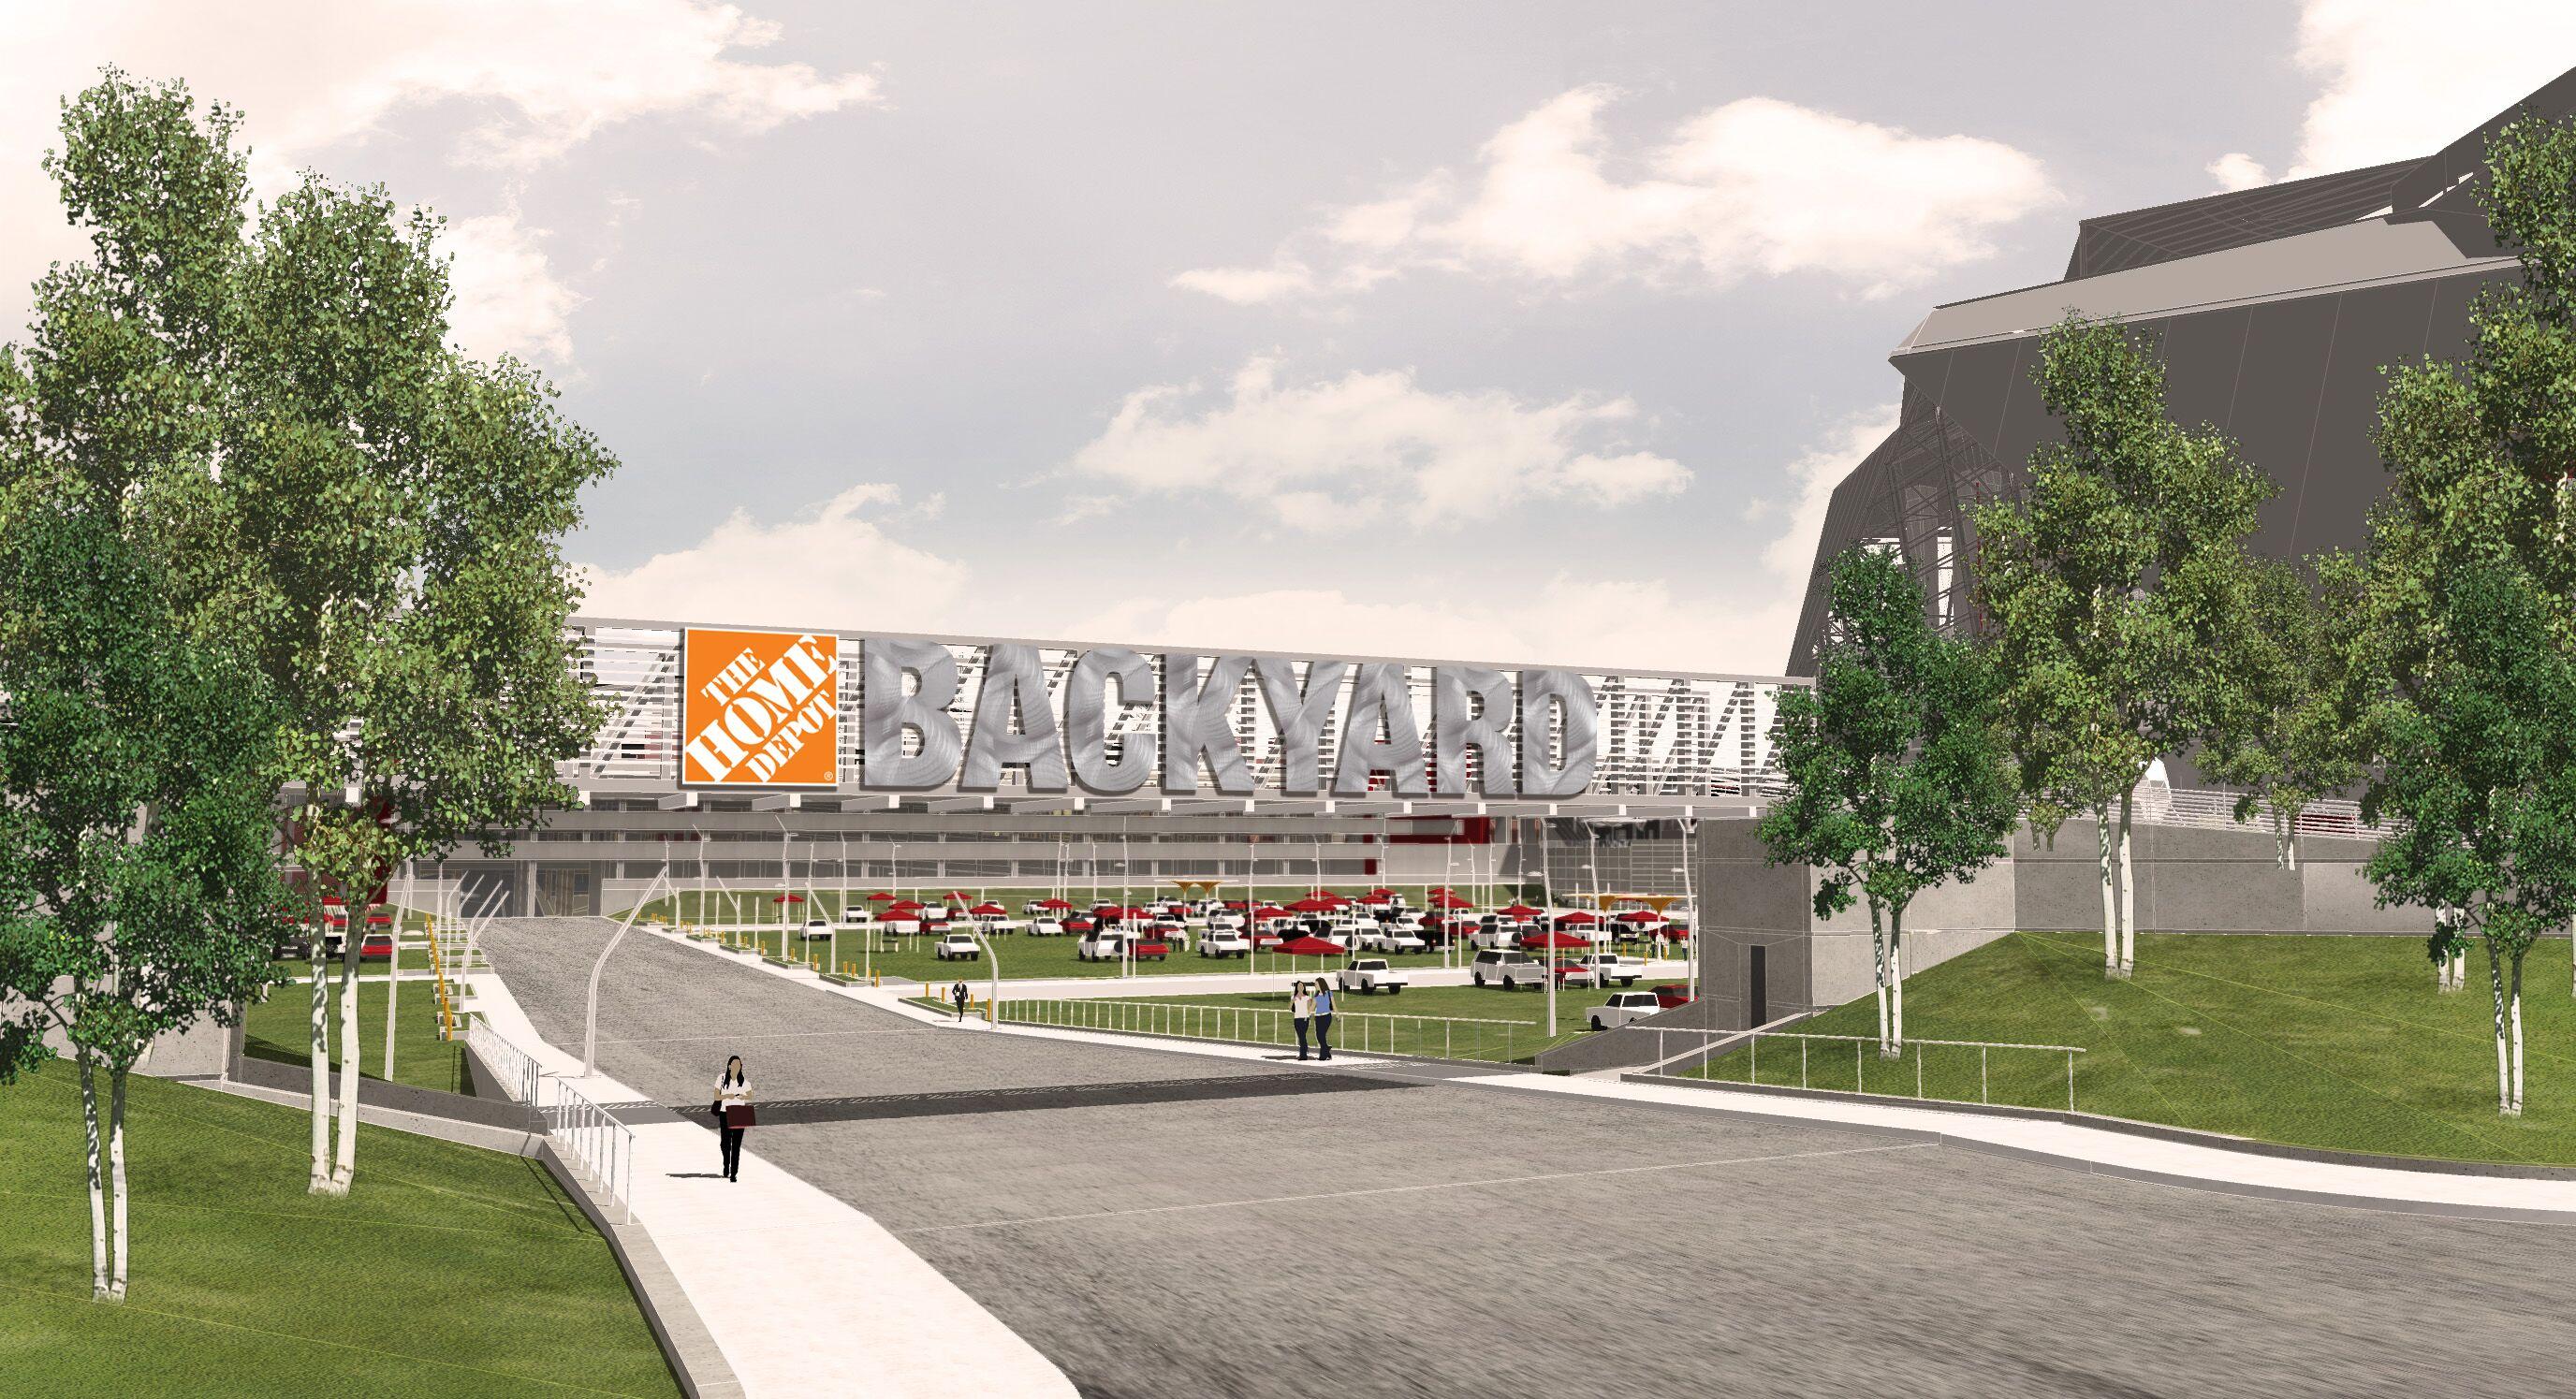 Meet the Atlanta Falcons\' new greenspace at Mercedes-Benz Stadium ...